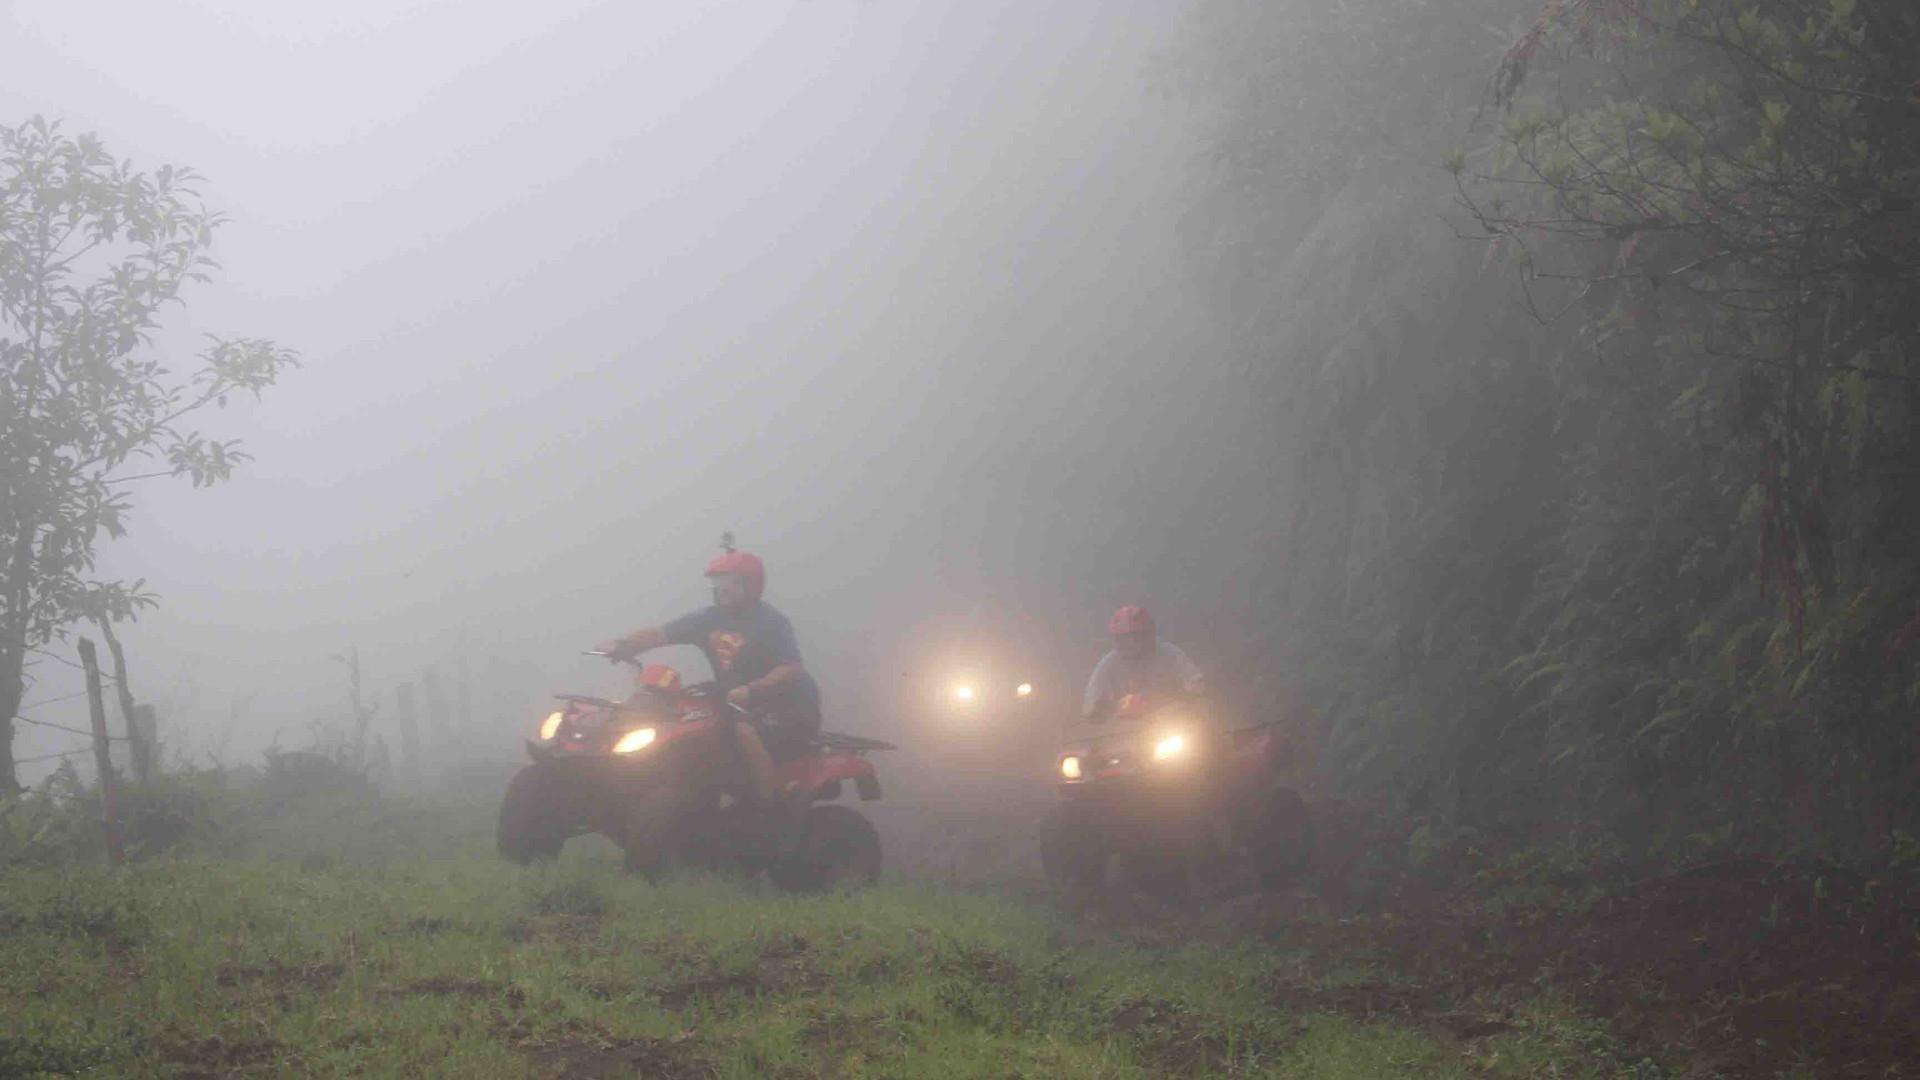 Costa Rica Monteverde Costa Rica ATV adventure tour group riding through dense fog cloud with lights on